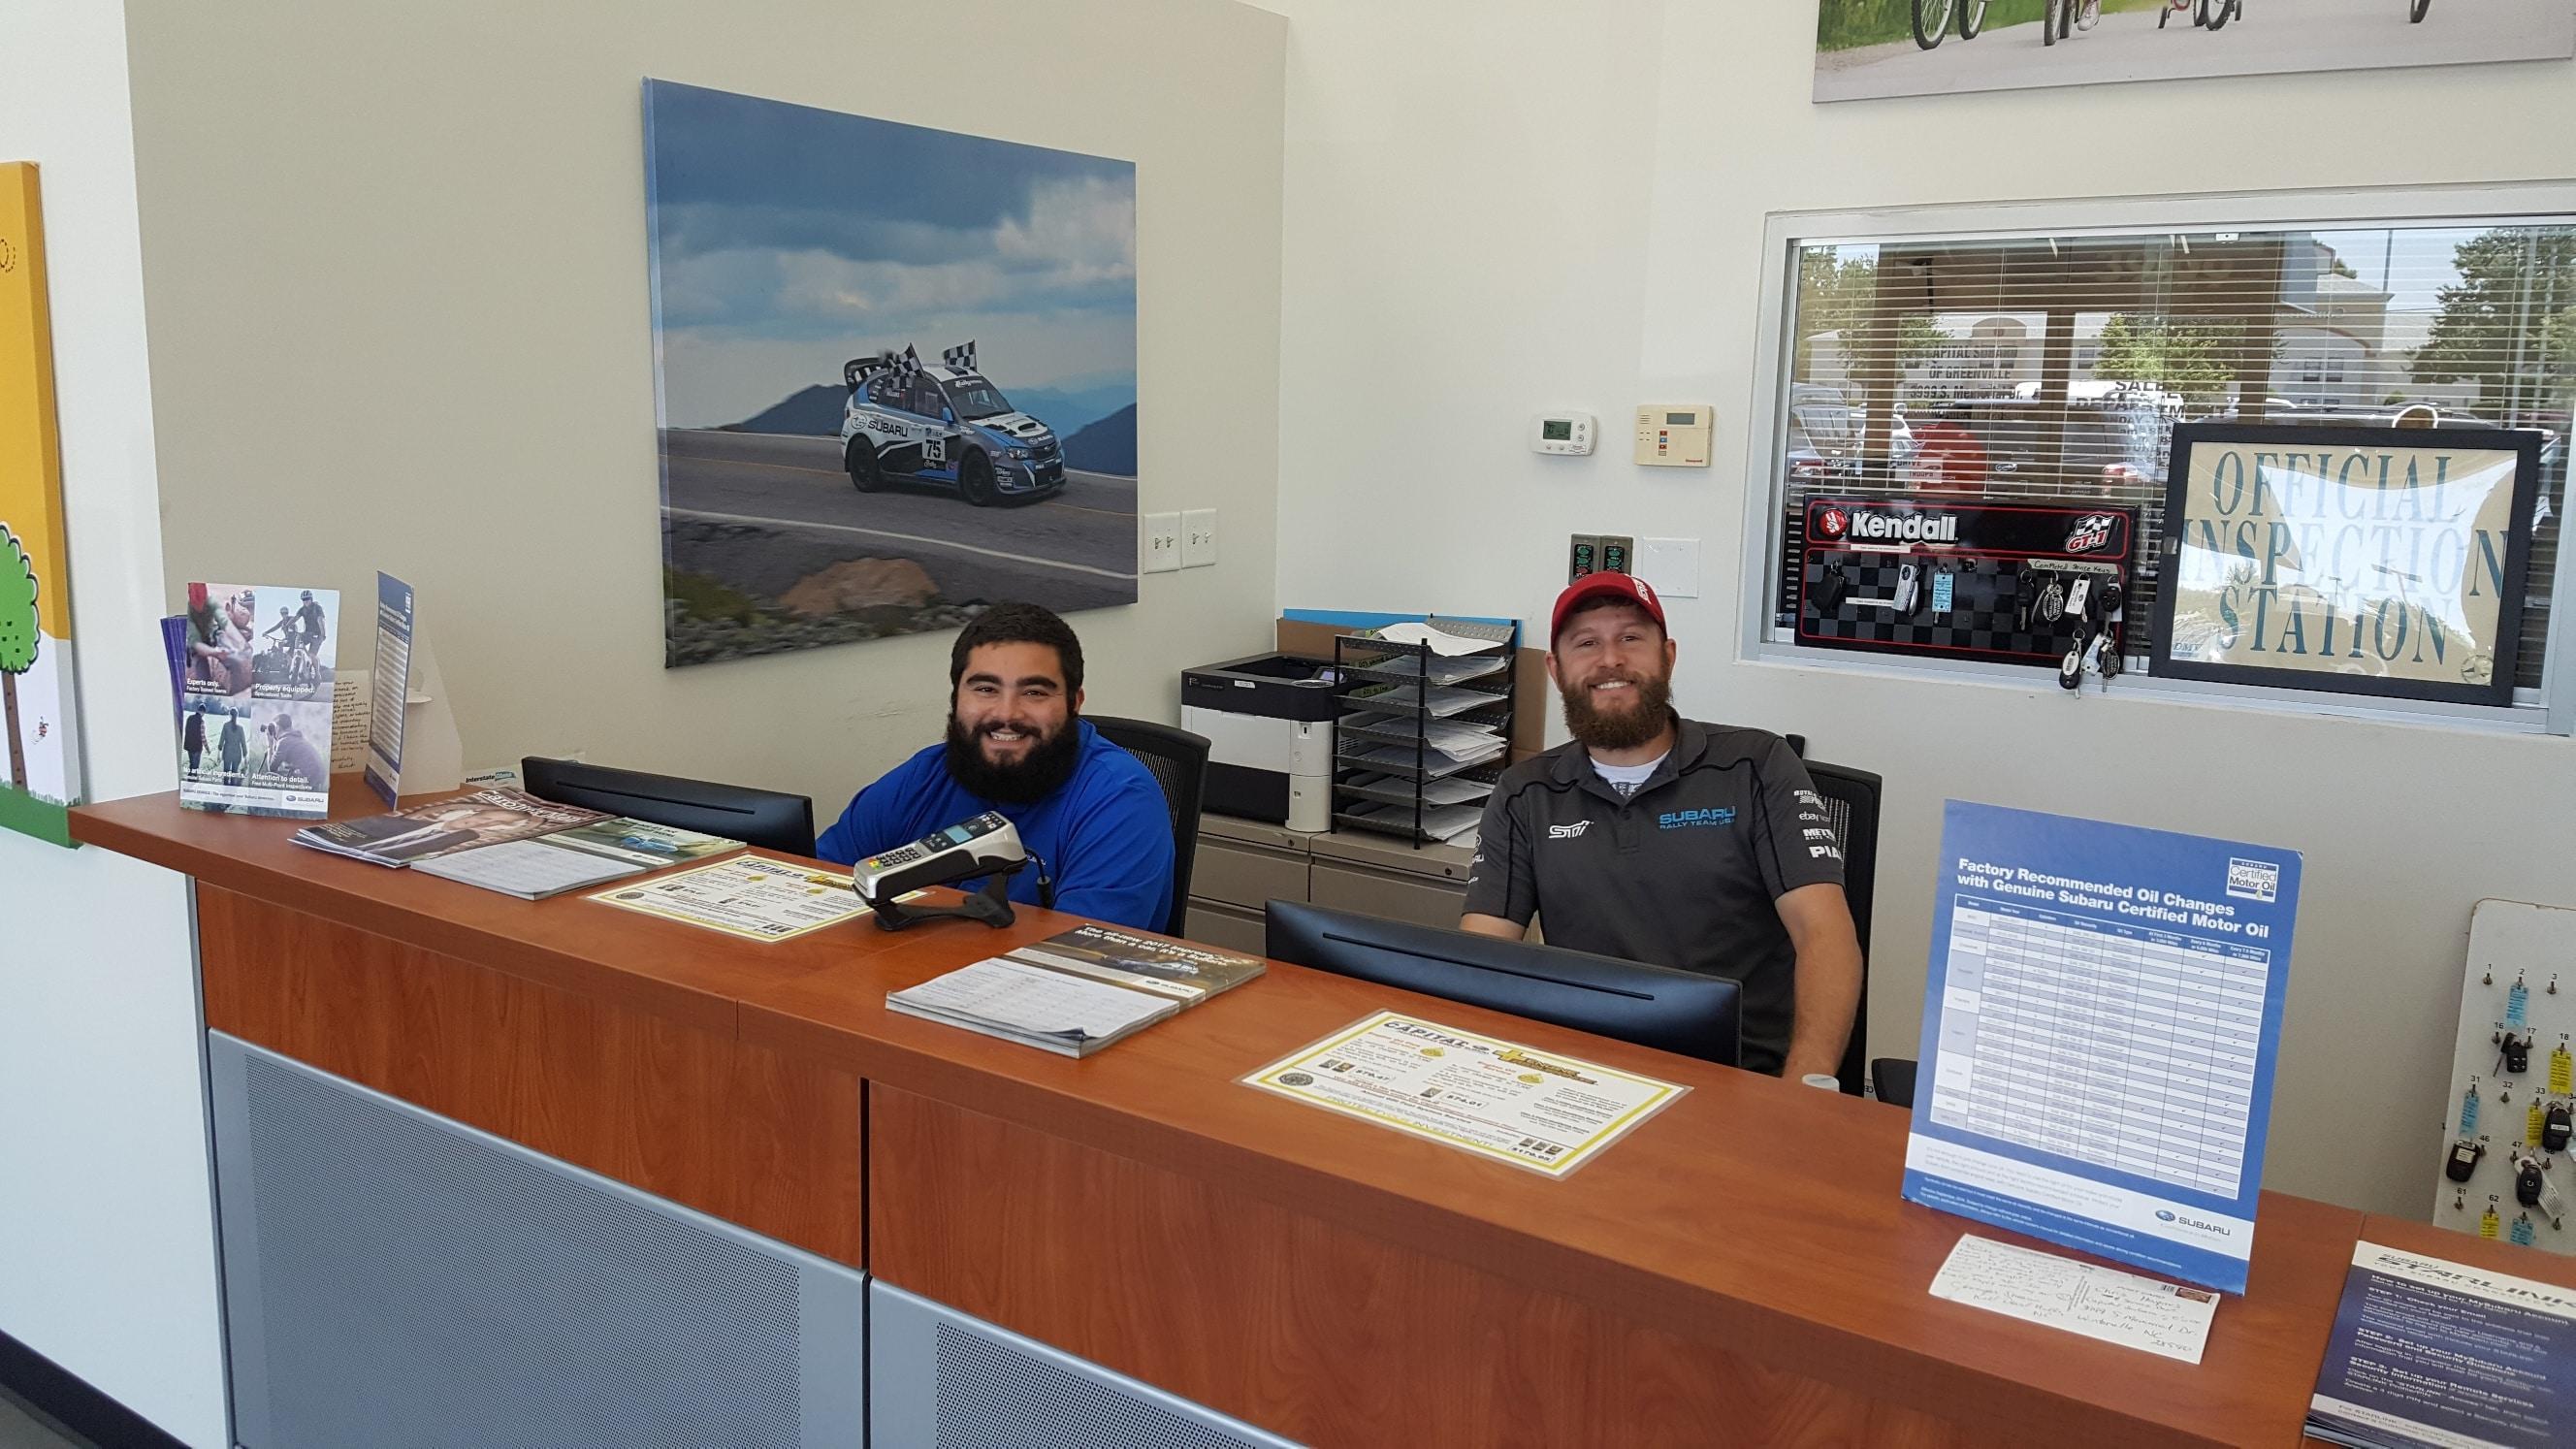 Subaru Car Repair & Auto Service near Greenville NC